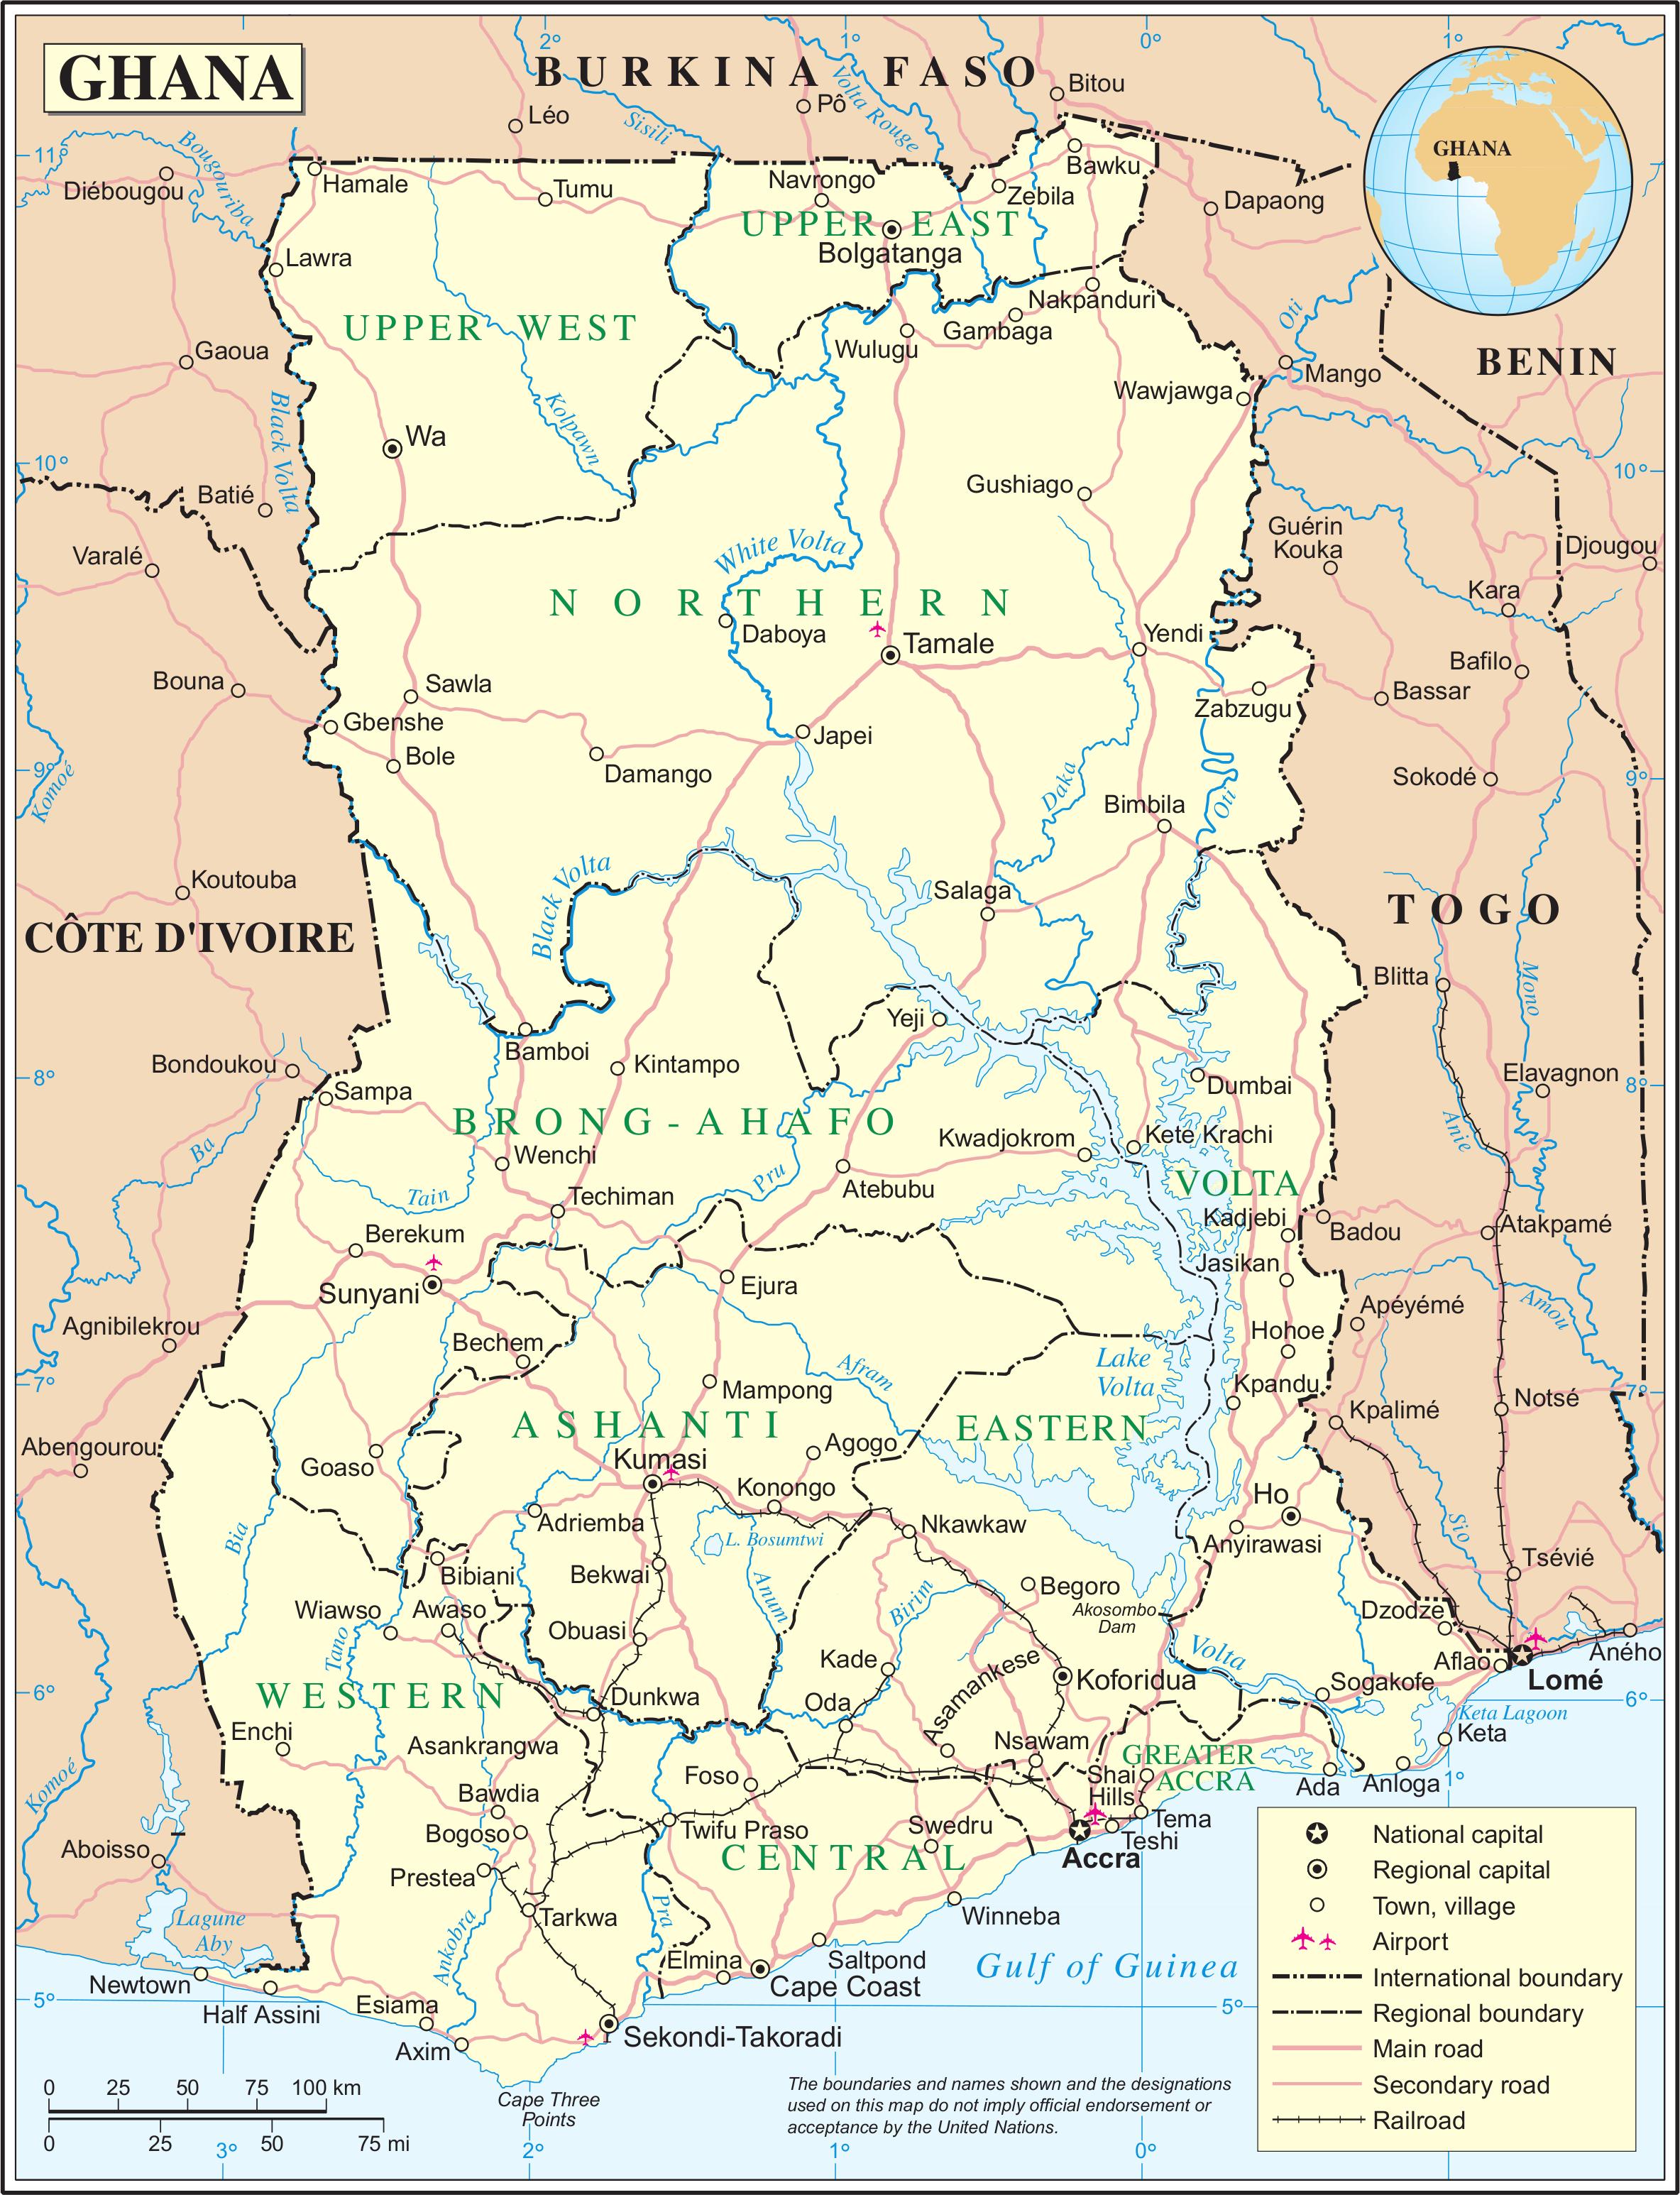 Map of the Ghana